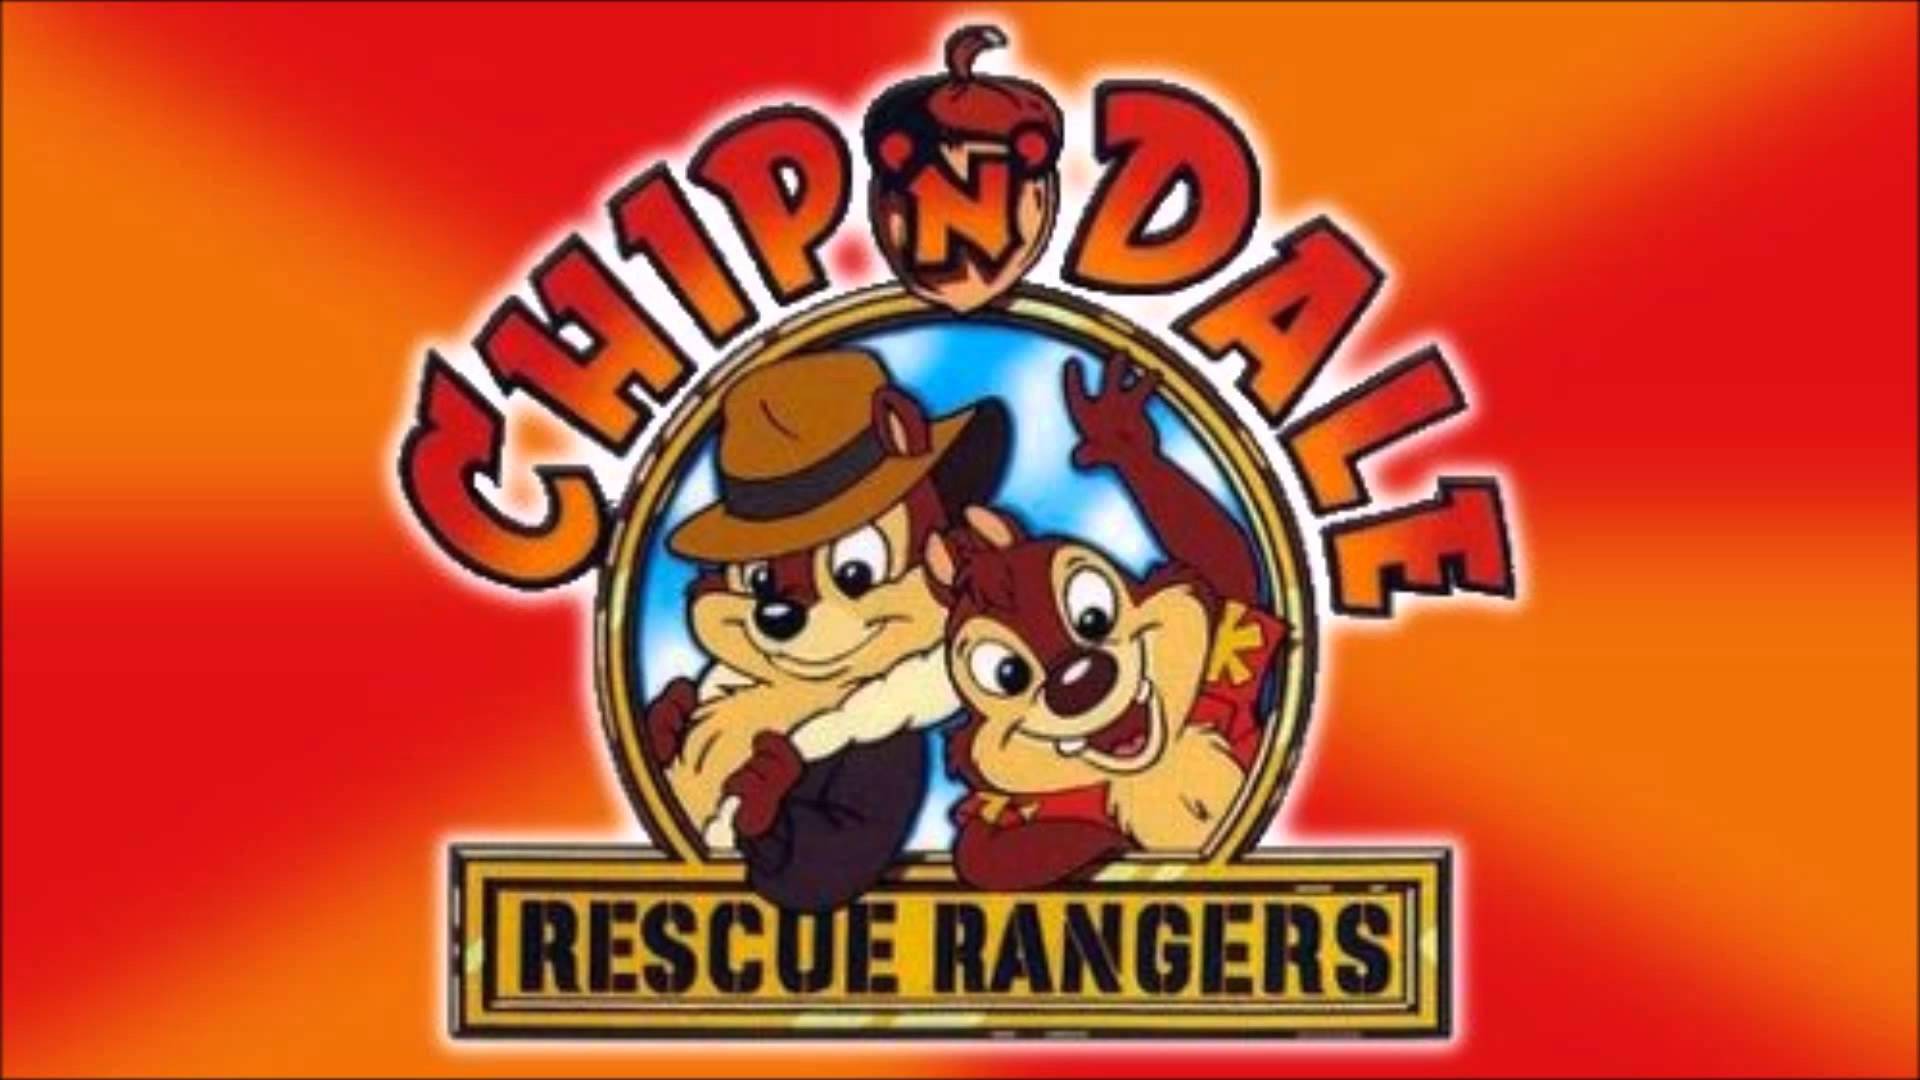 Chip 'n Dale Rescue Rangers Backgrounds, Compatible - PC, Mobile, Gadgets| 1920x1080 px